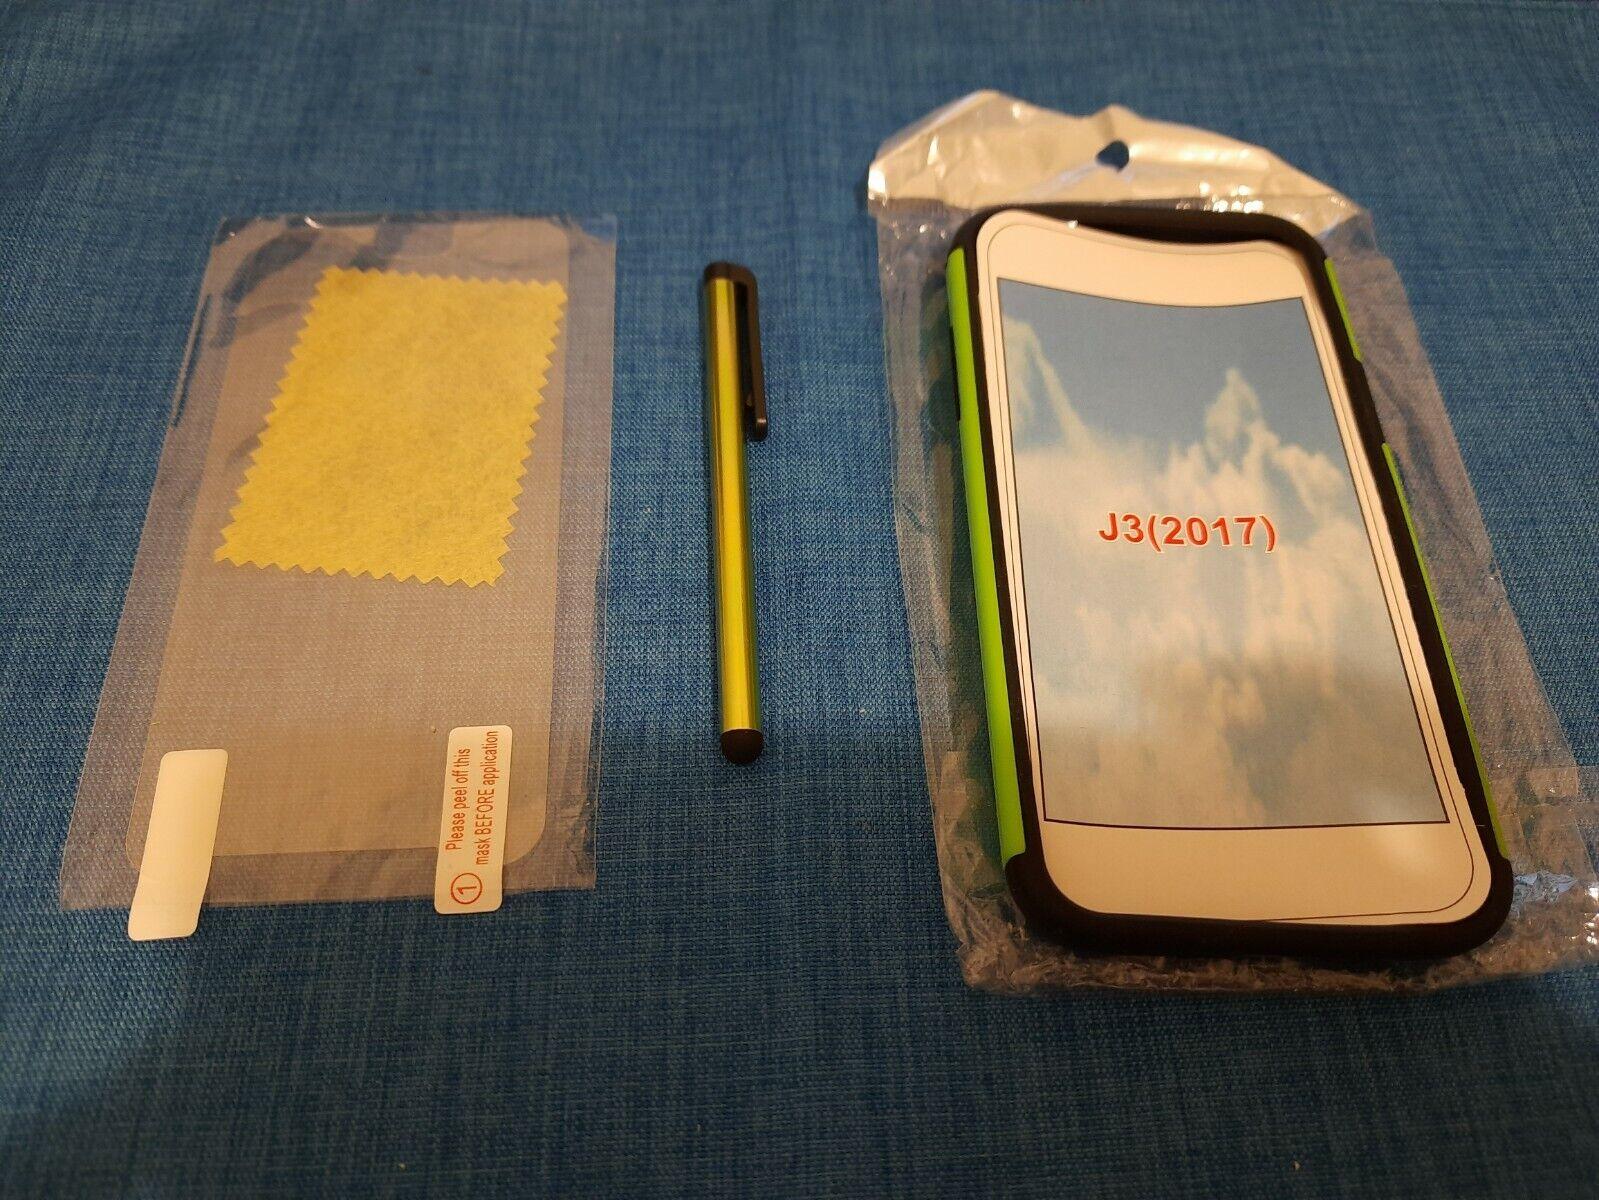 Case For Samsung Galaxy J3 Prime - $8.50